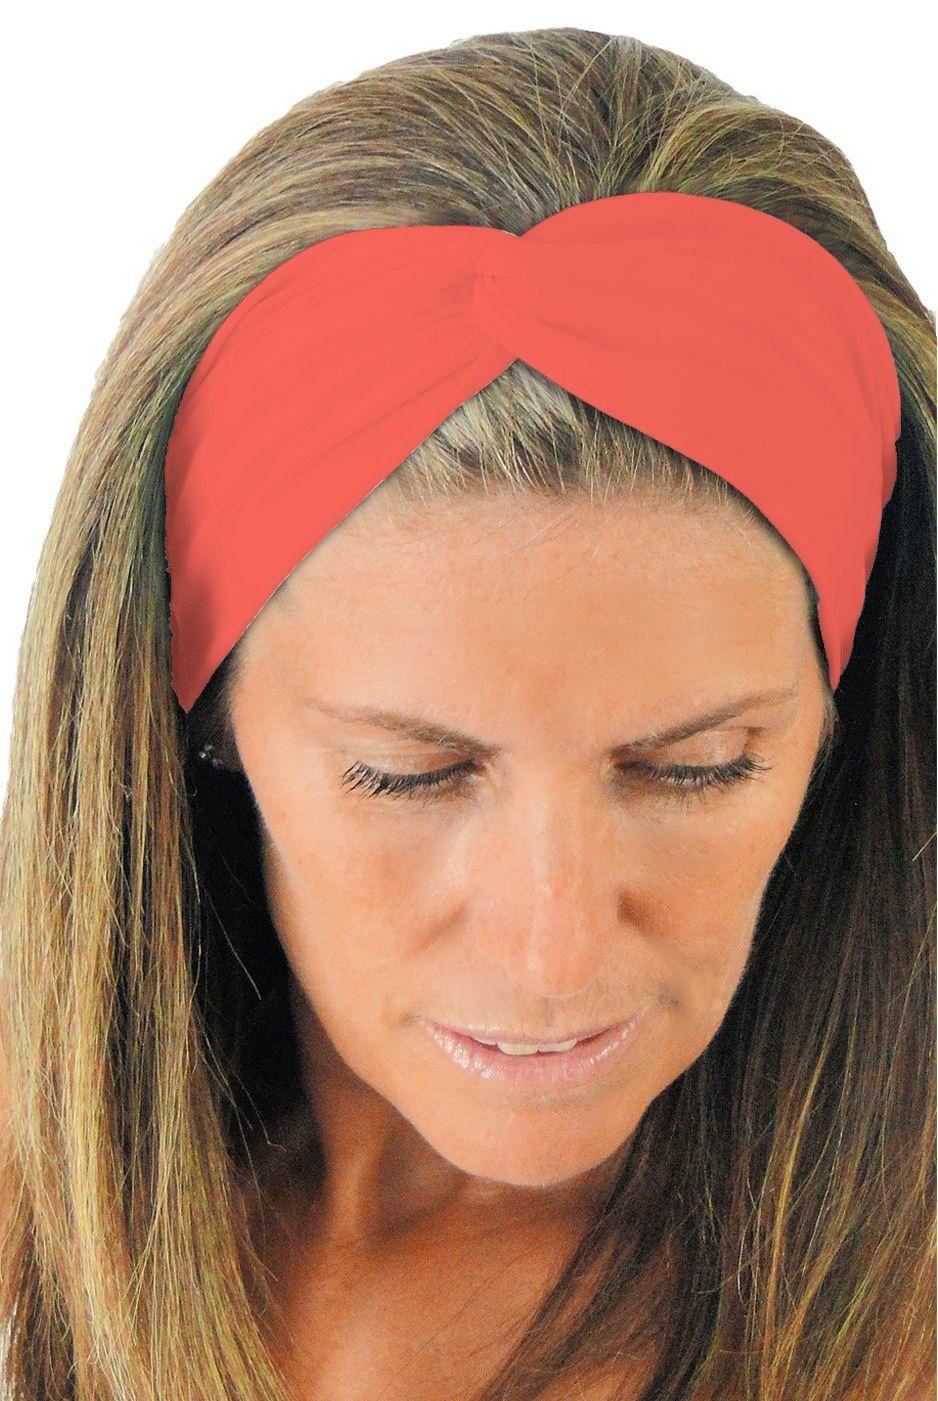 1cad8eb1e3f ice cream KNOTTED Twist Arancio Orange Yoga Headband    Click image to  review more details. (Amazon affiliate link)